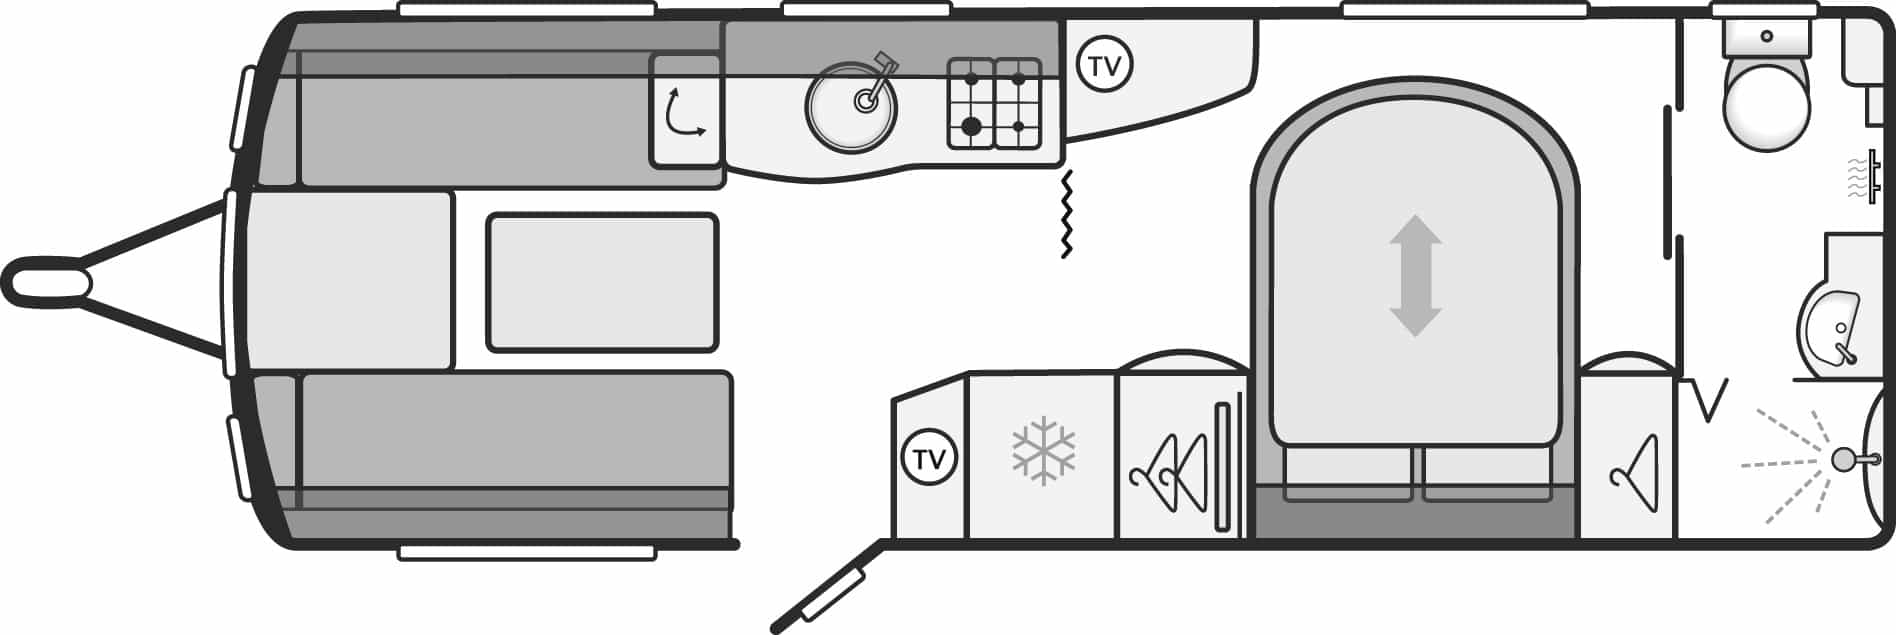 Elegance 645 - 4 Berth, Twin Axle, Transverse Bed, End Washroom